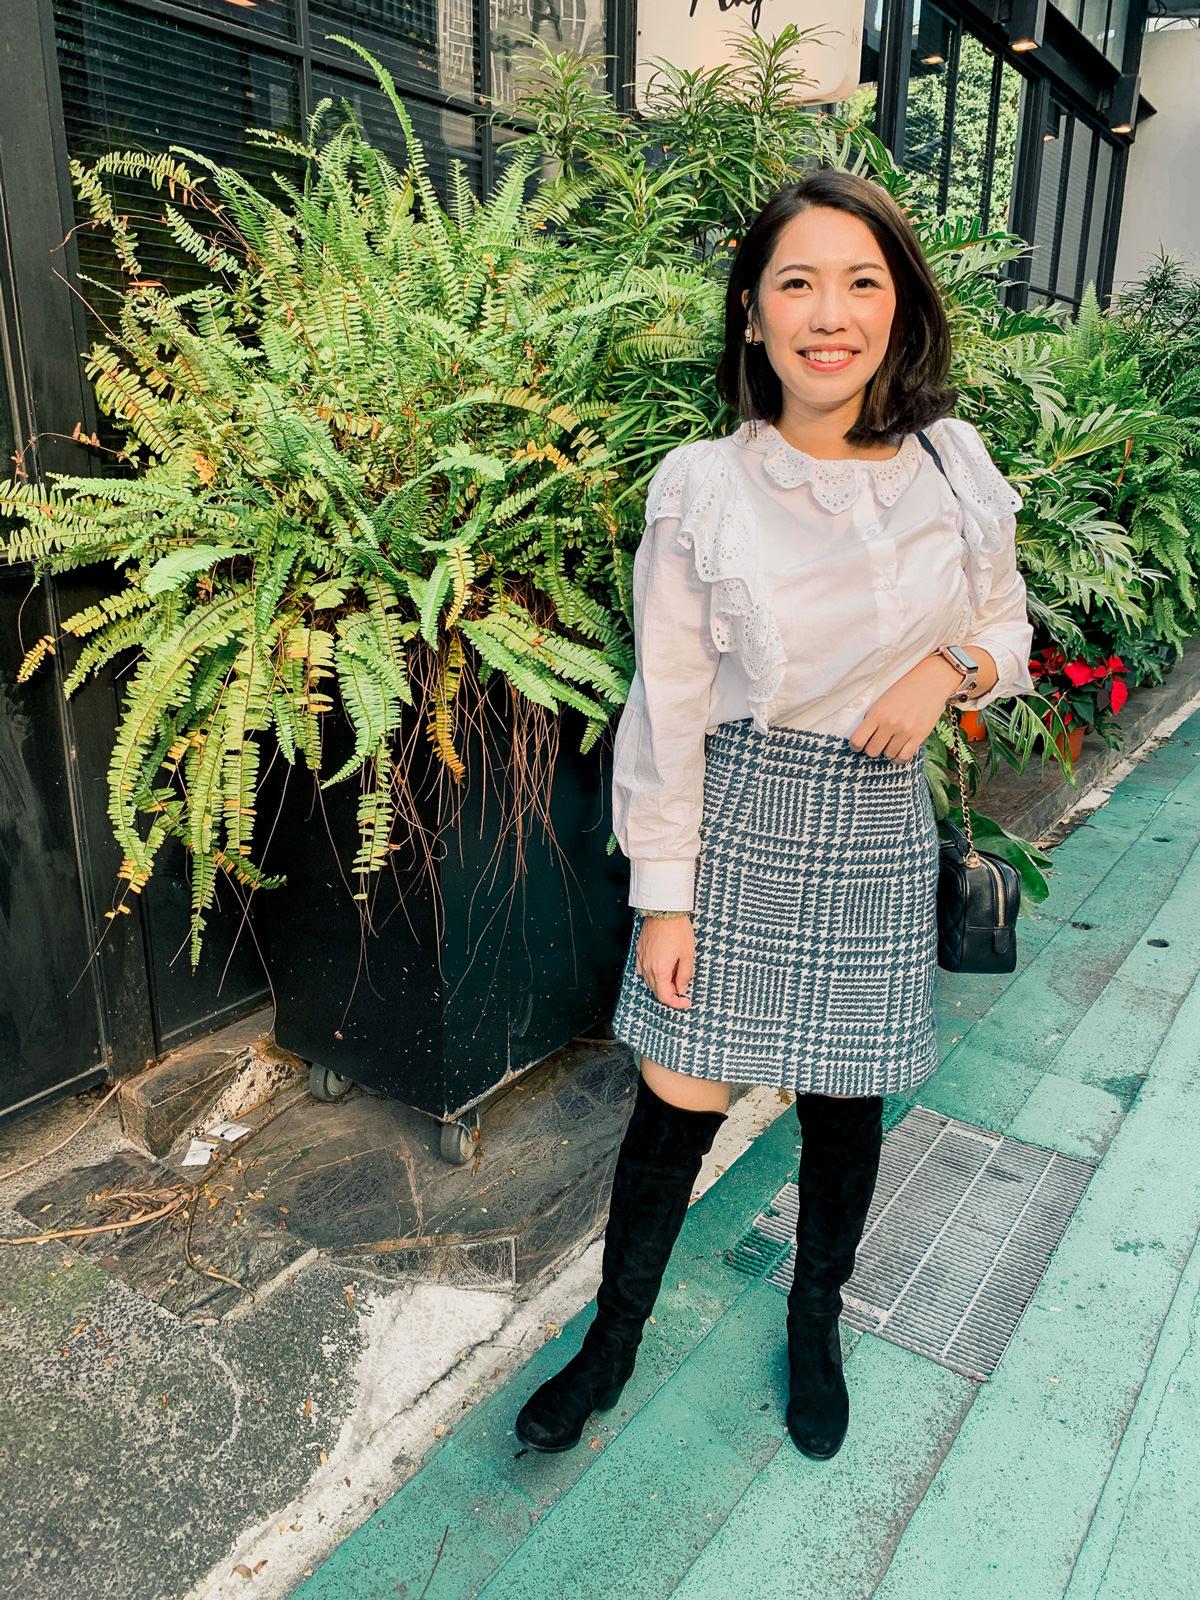 【Outfit】Mango Ruffled cotton blouse 蕾絲拼接襯衫 & Stuart Weitzman Reserve 過膝靴 小隻女真實心得分享😛